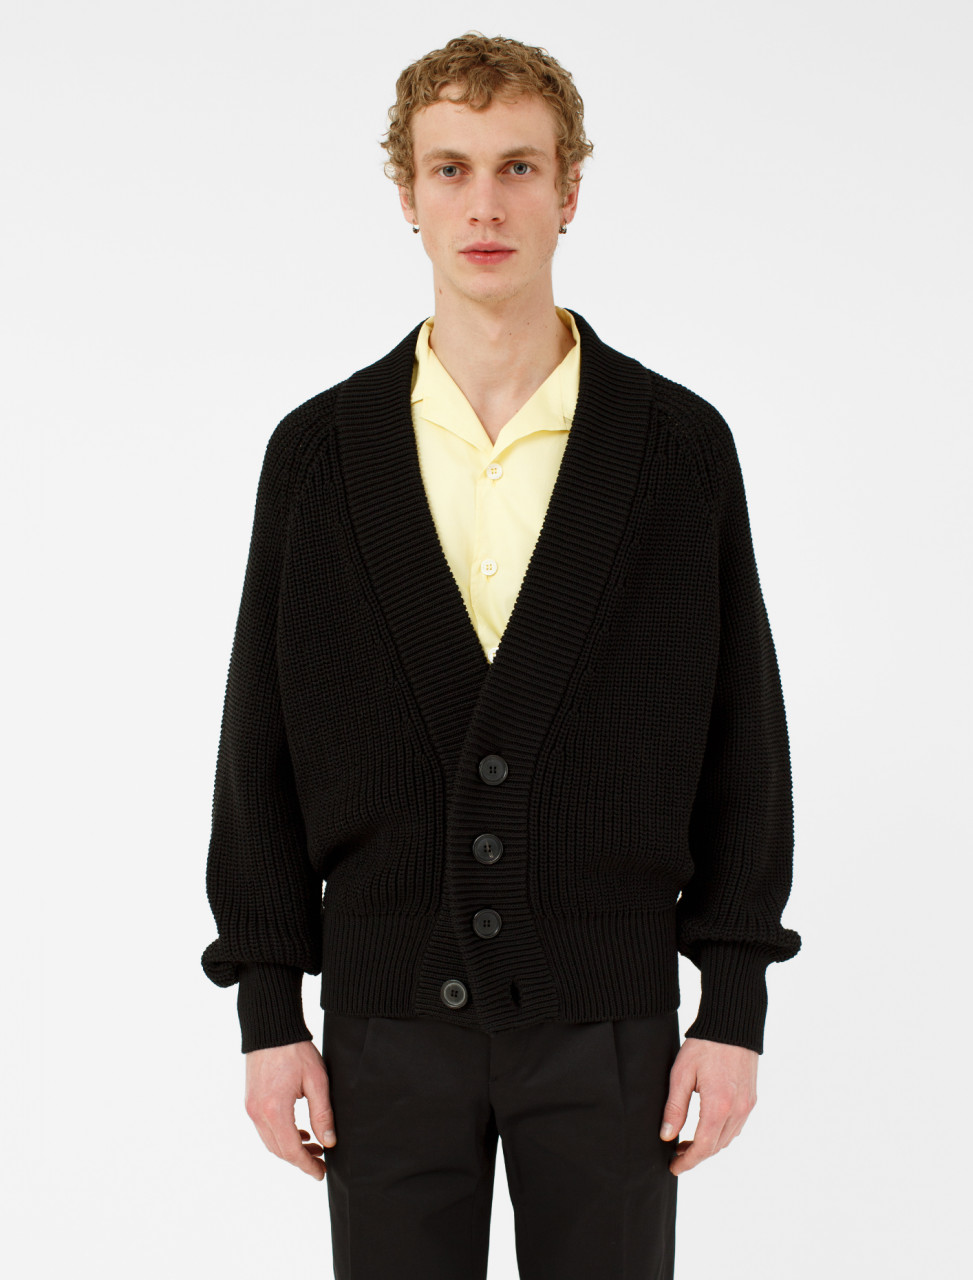 Cotton Cardigan in Black